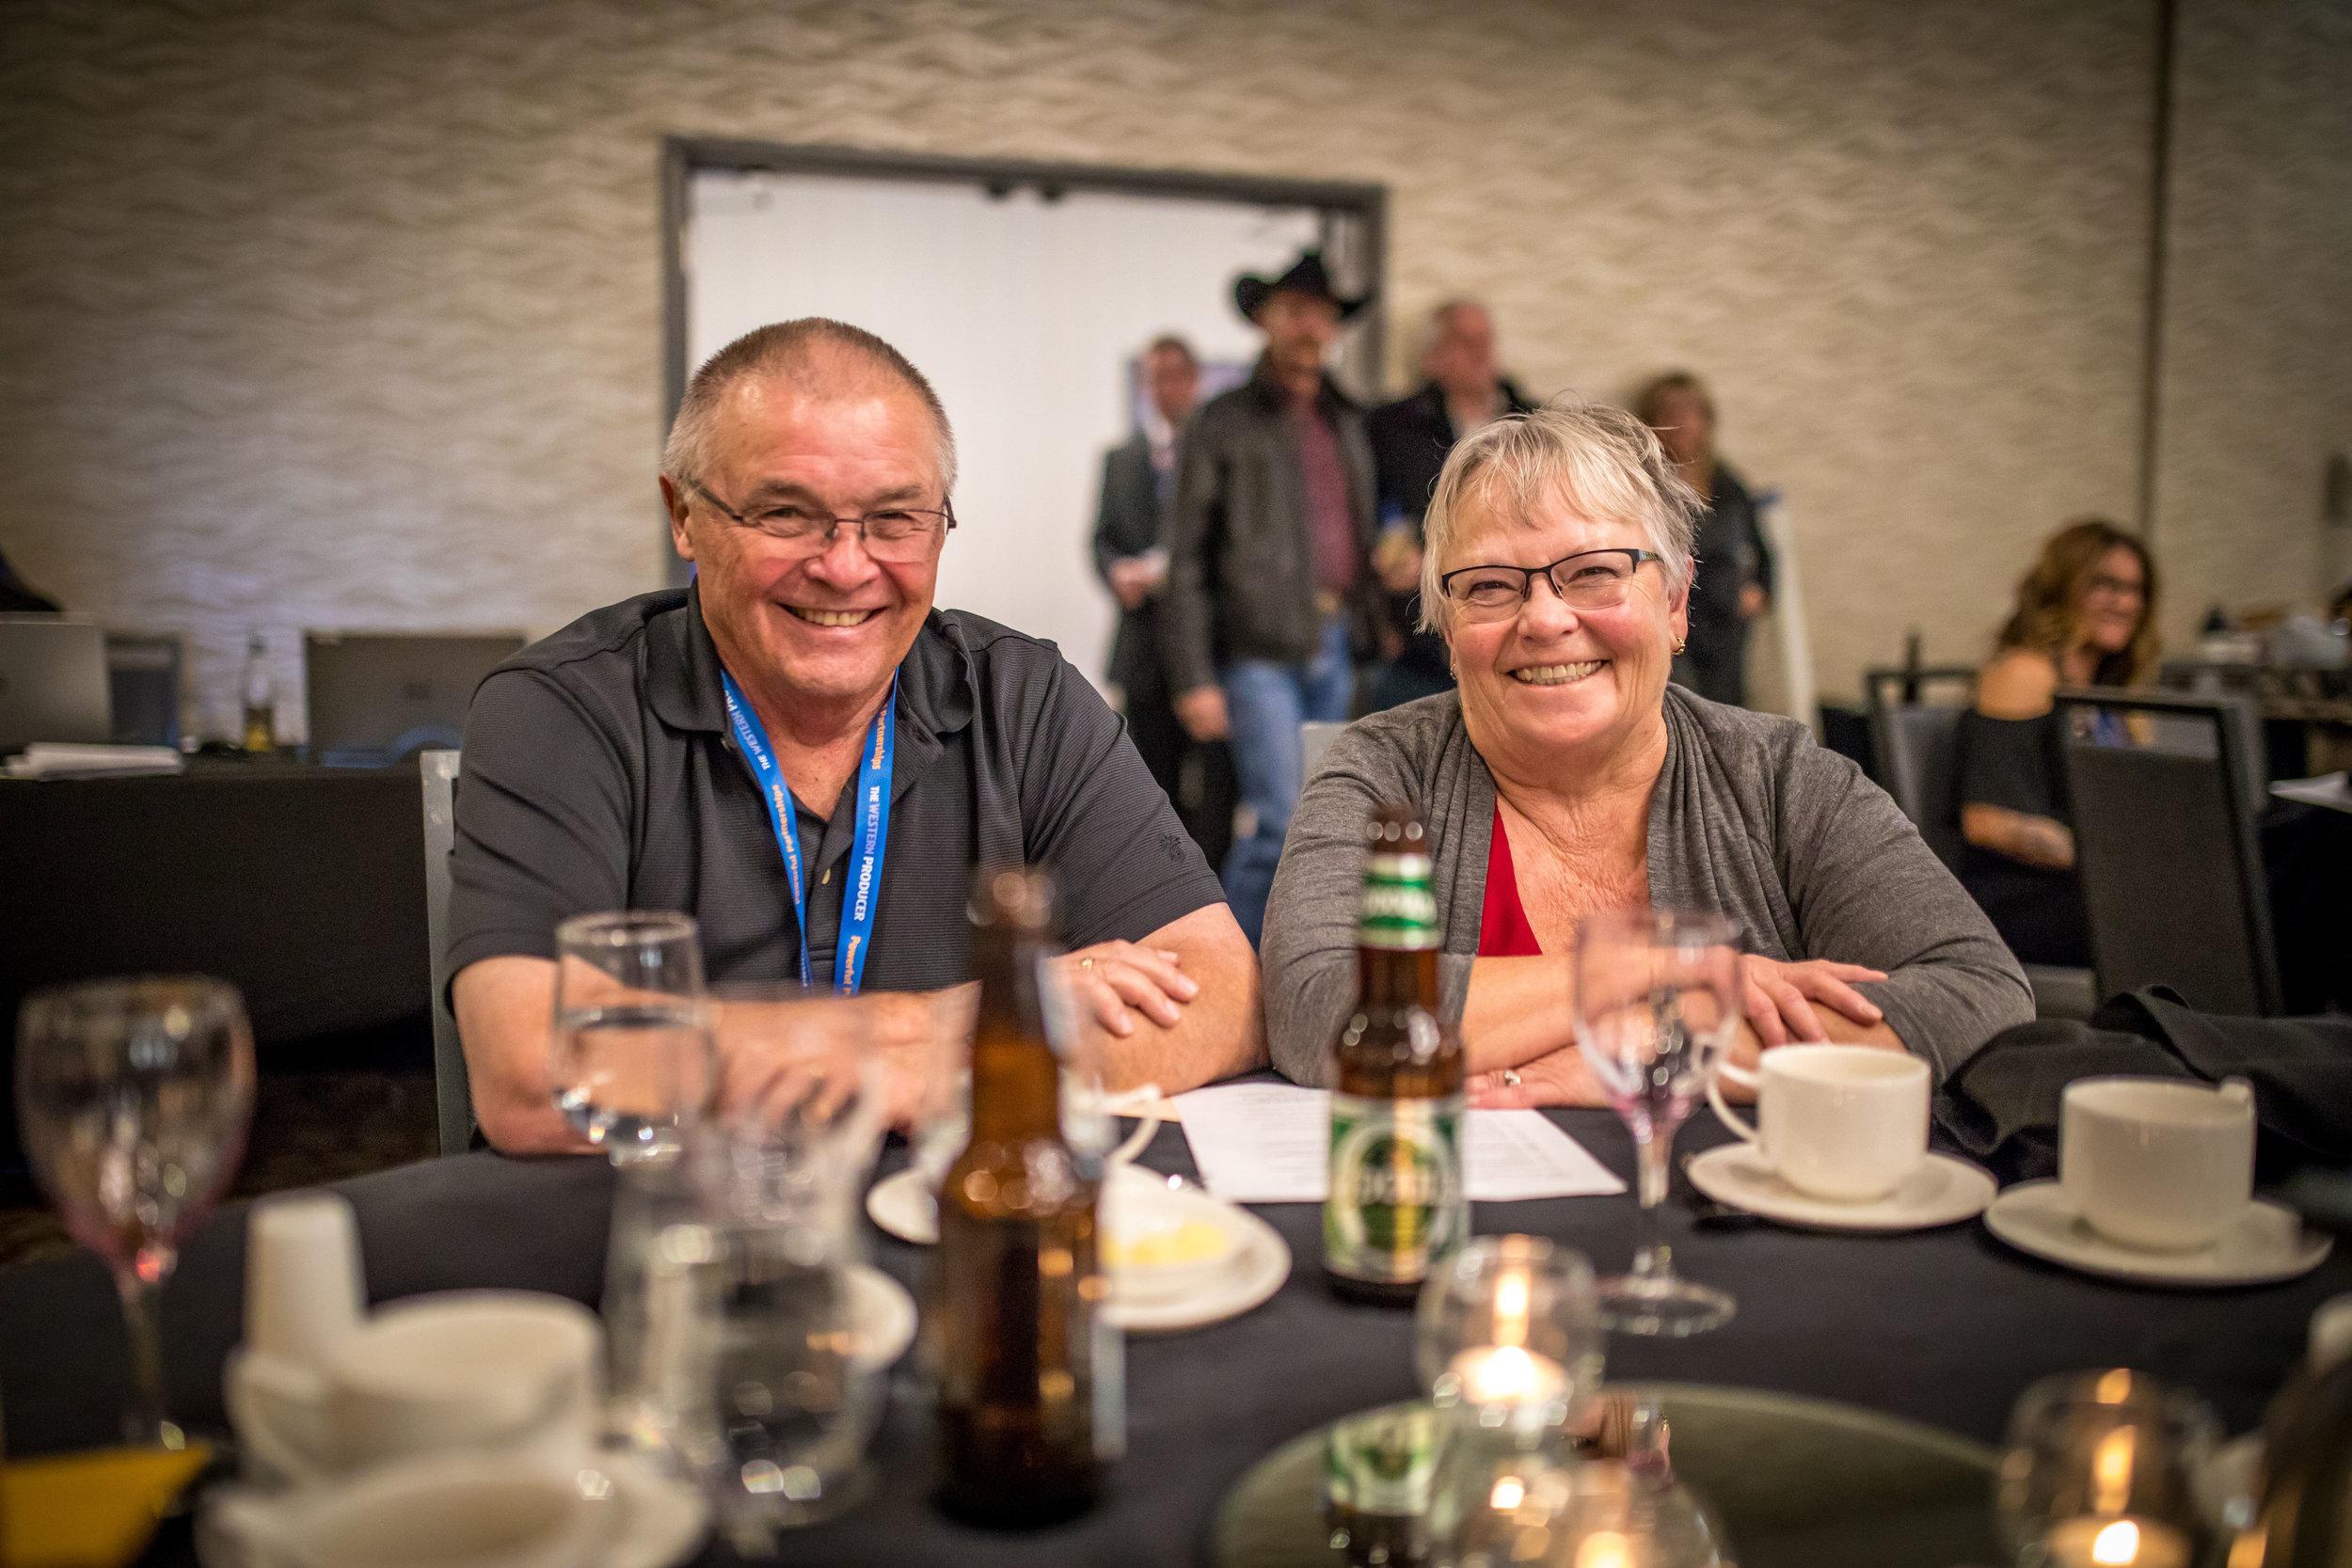 2019 02-01 Alberta Auctioneer Convention Day 02 - Calgary 105.jpg